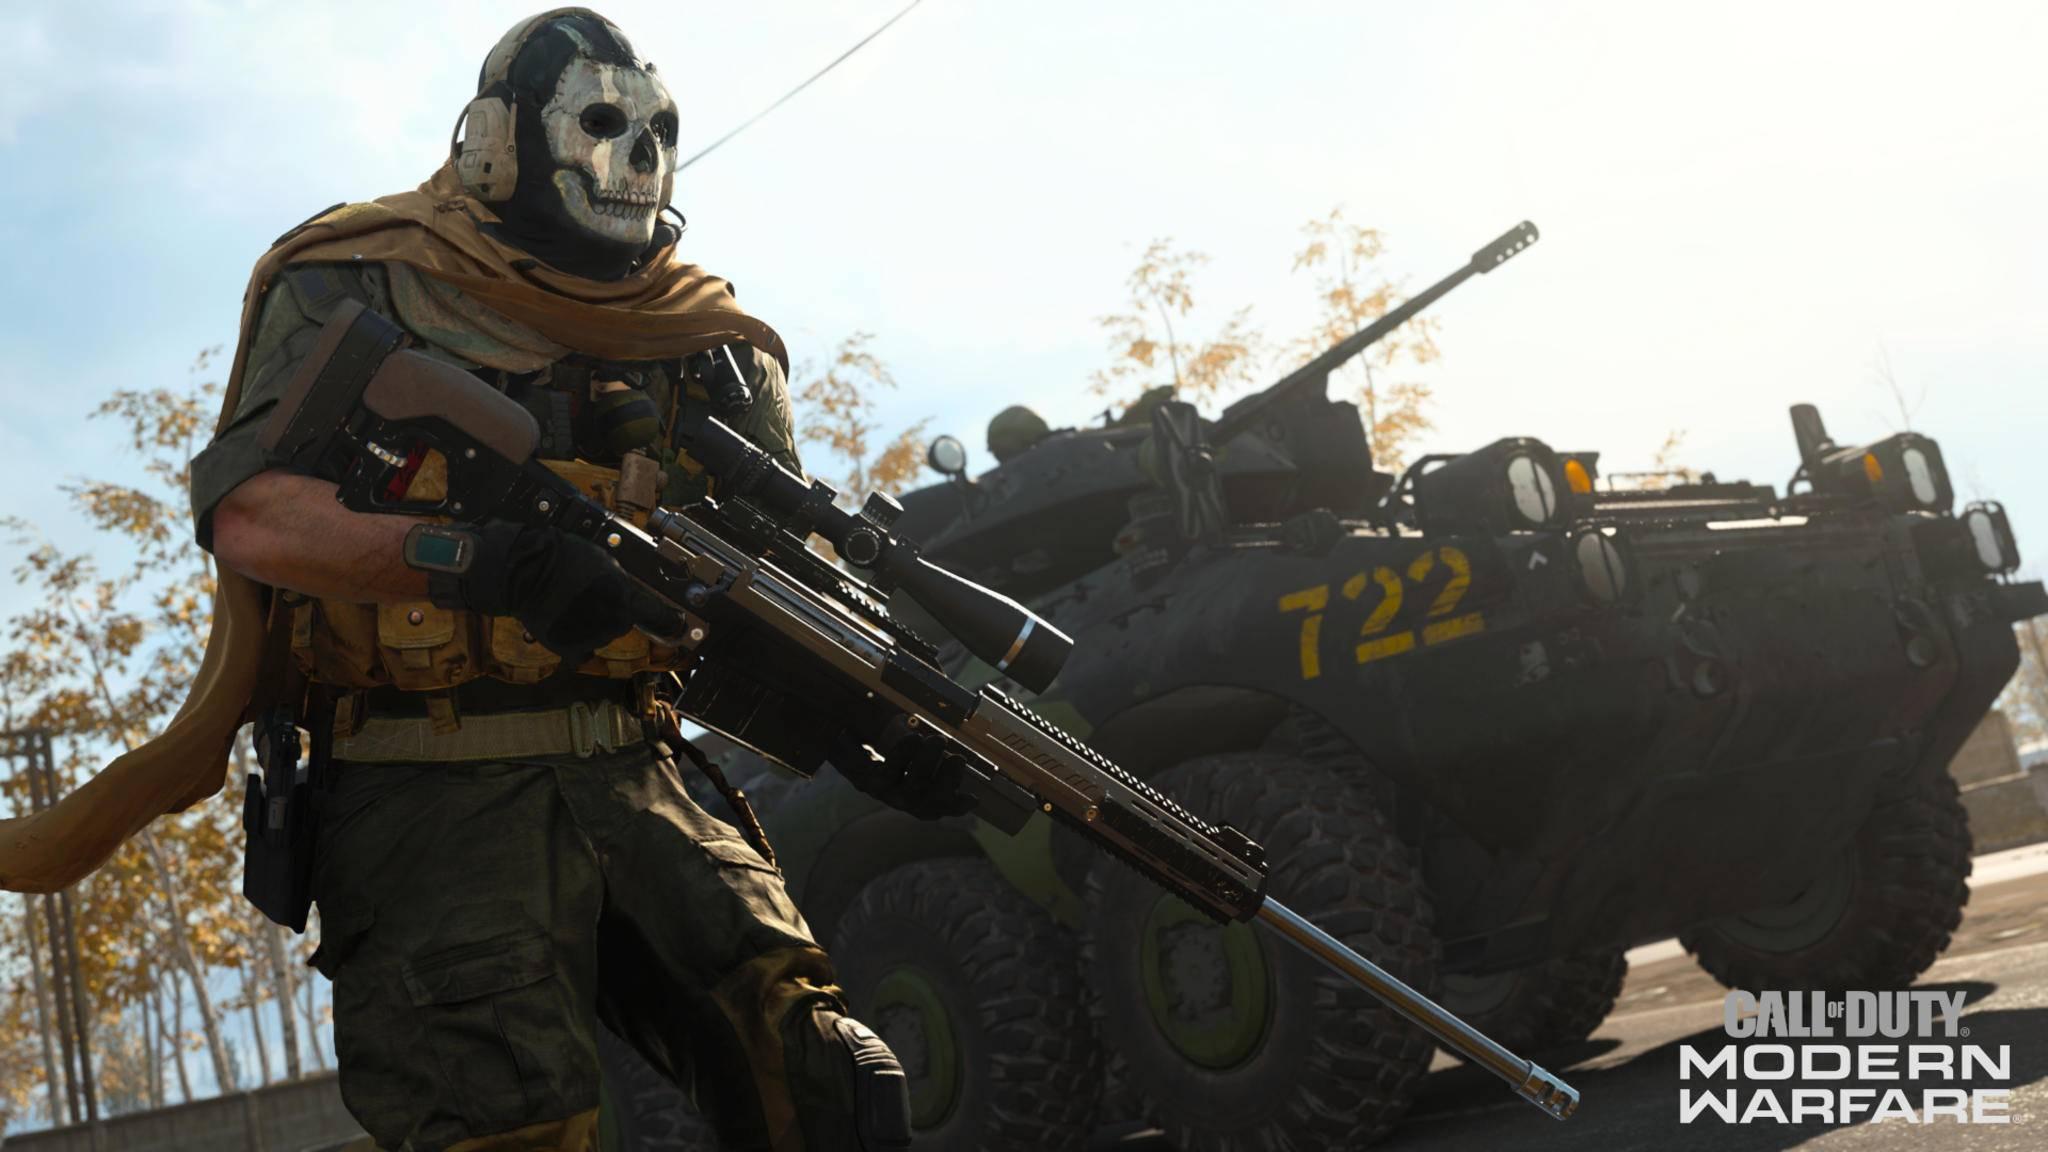 call-of-duty-modern-warfare-ghost-panzer